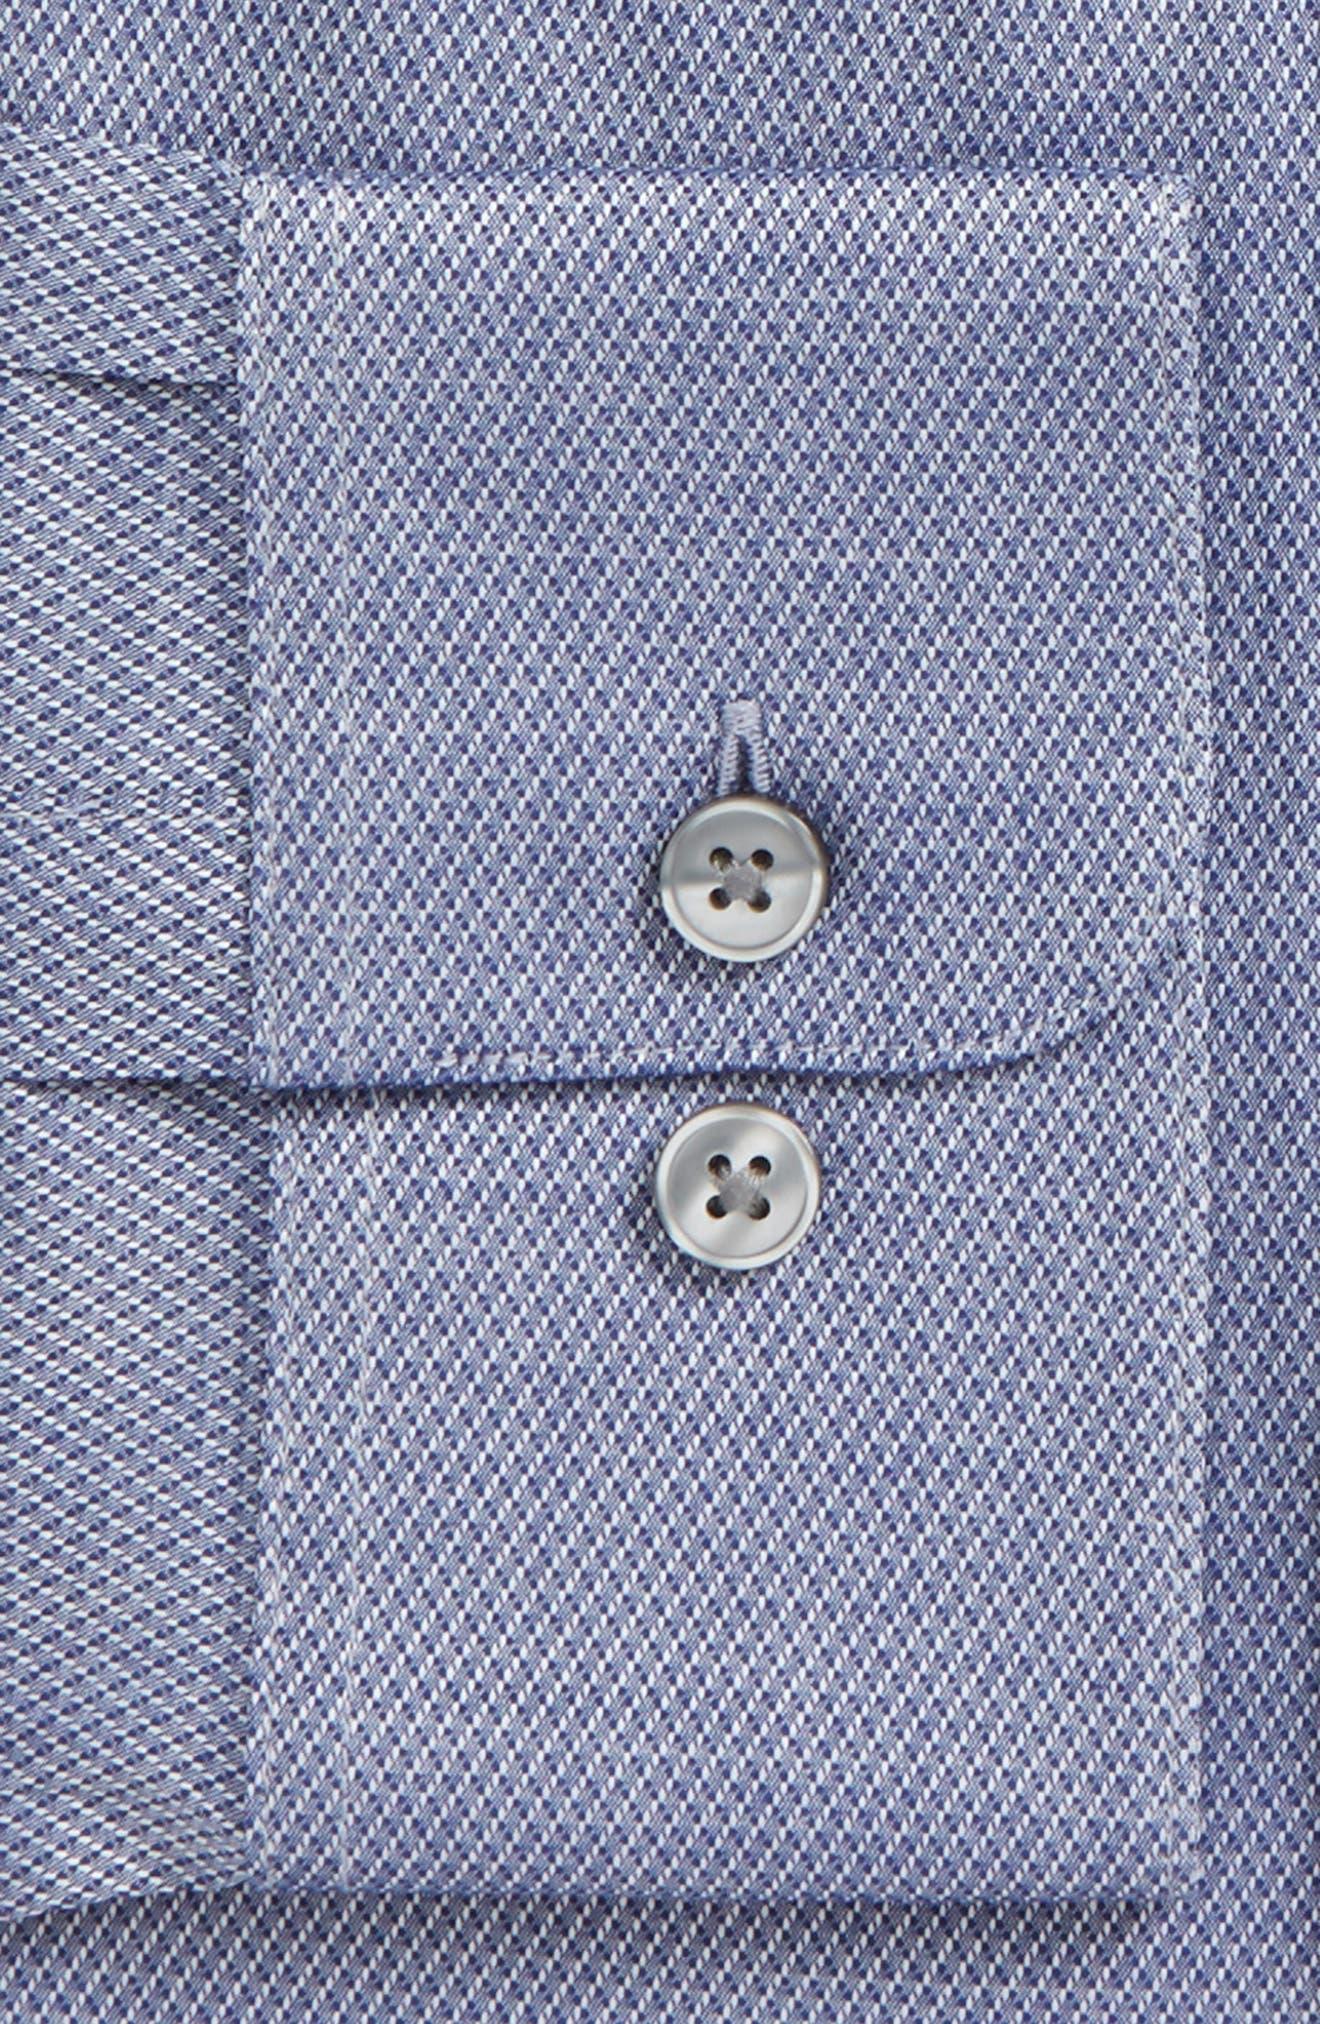 Regular Fit Dress Shirt,                             Alternate thumbnail 2, color,                             439